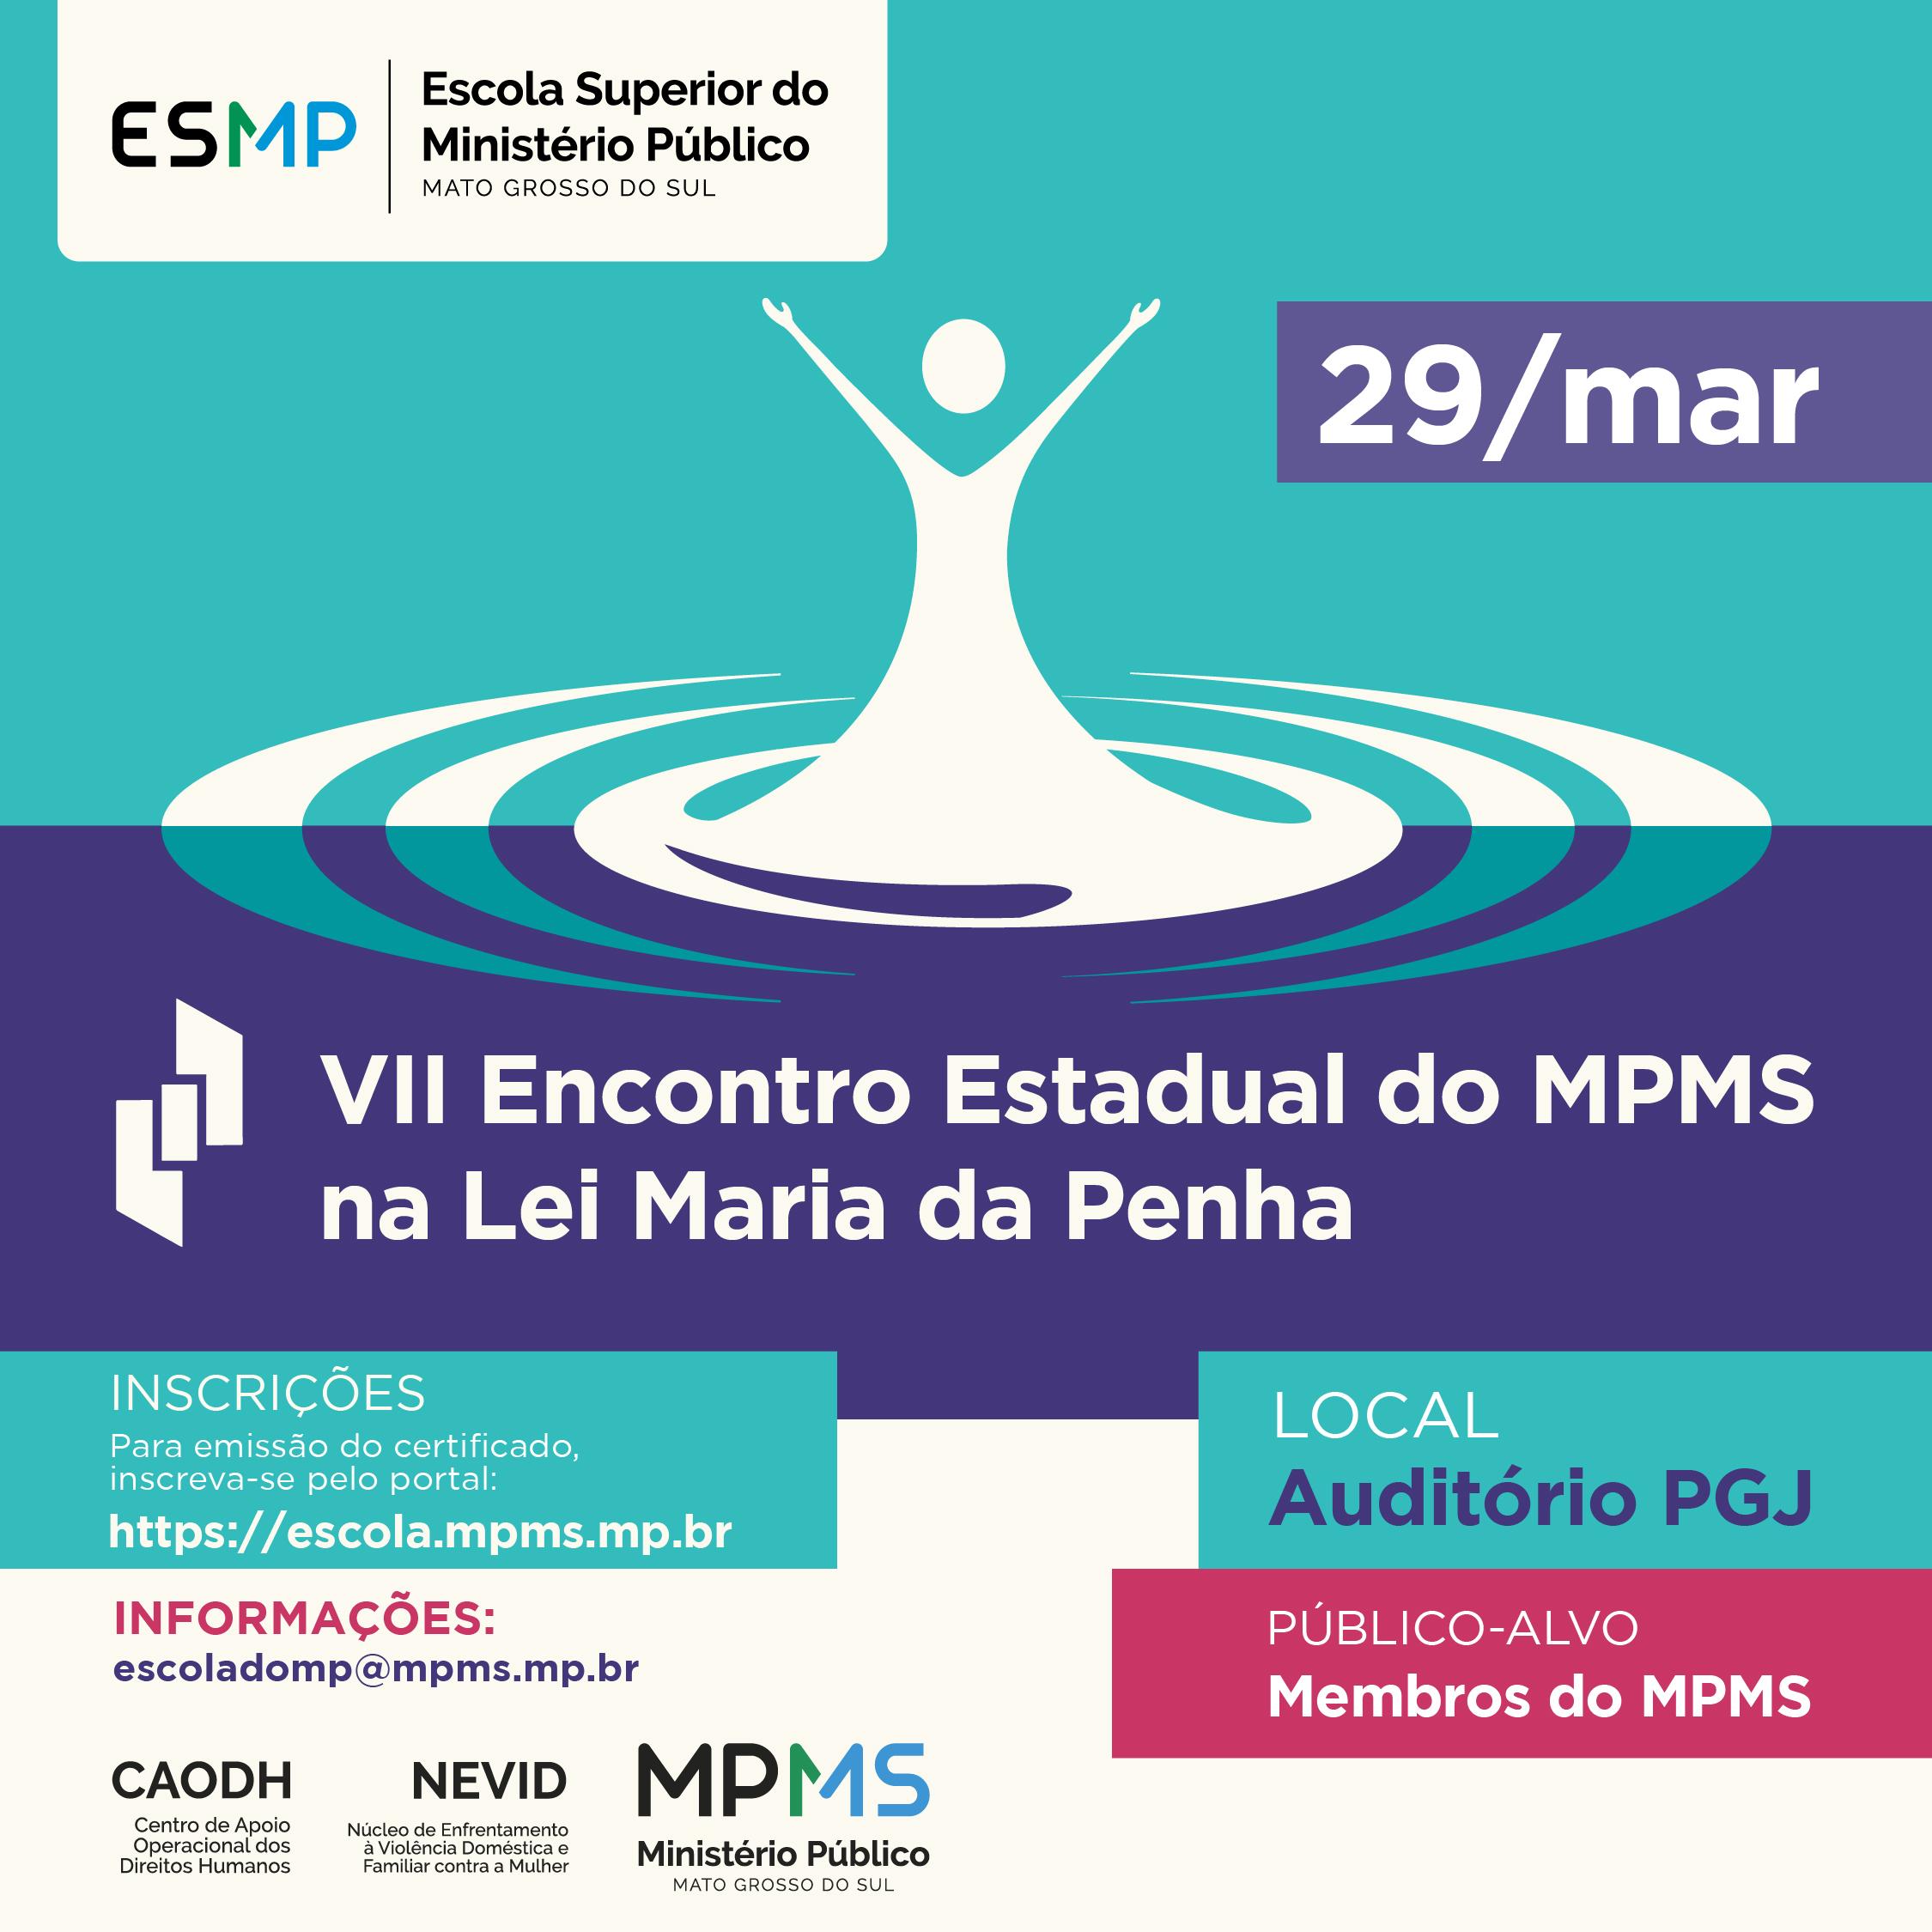 VII Encontro Estadual do MPMS na Lei Maria da Penha